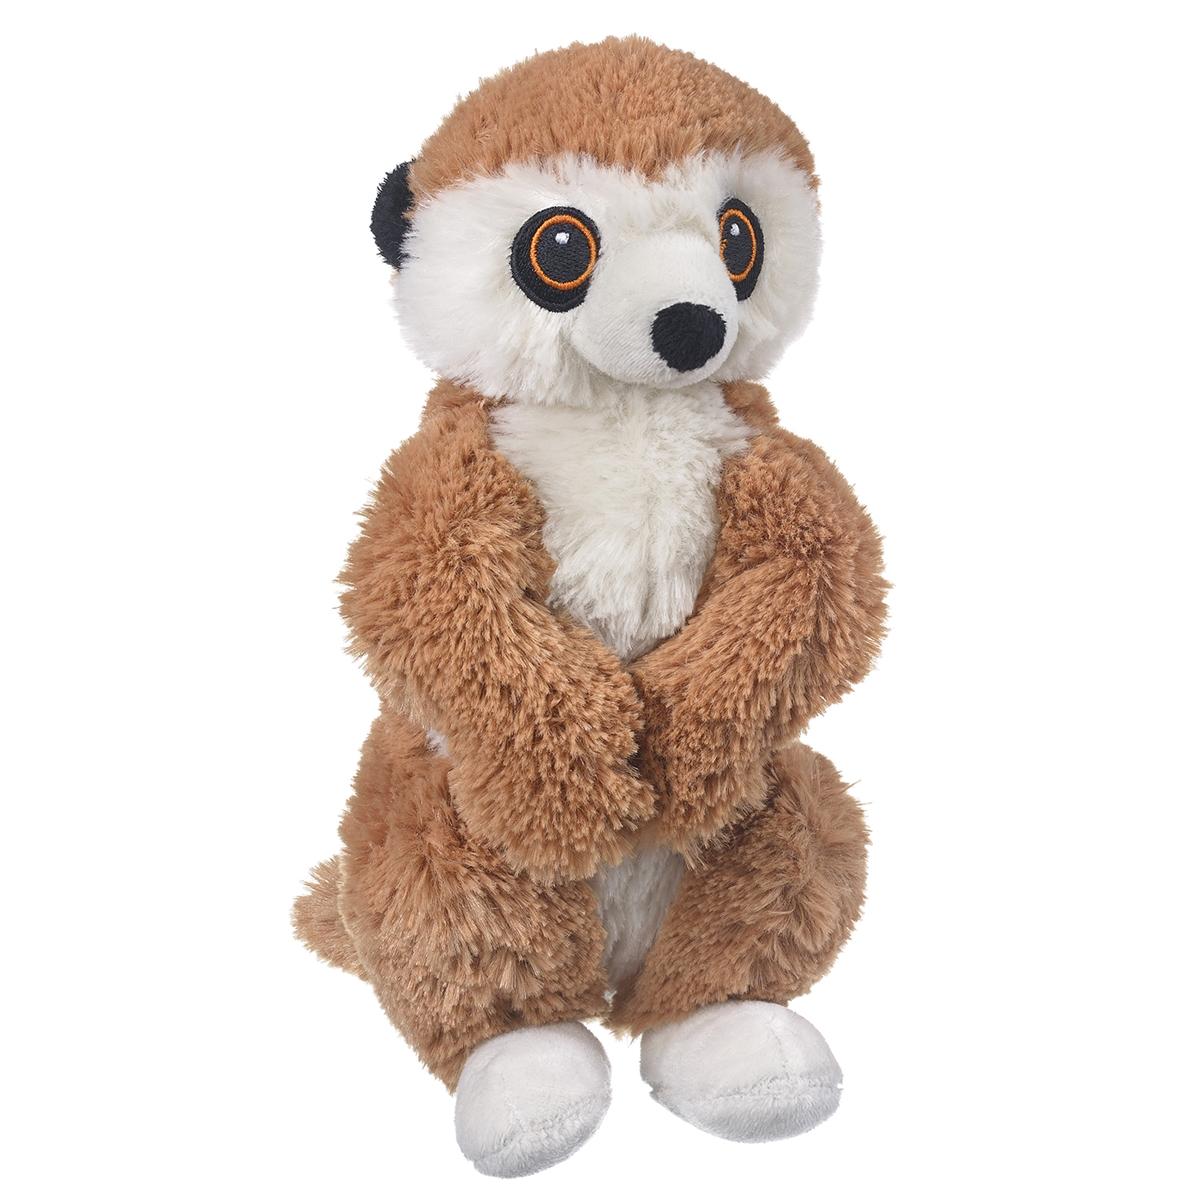 Meerkat Eco Plush